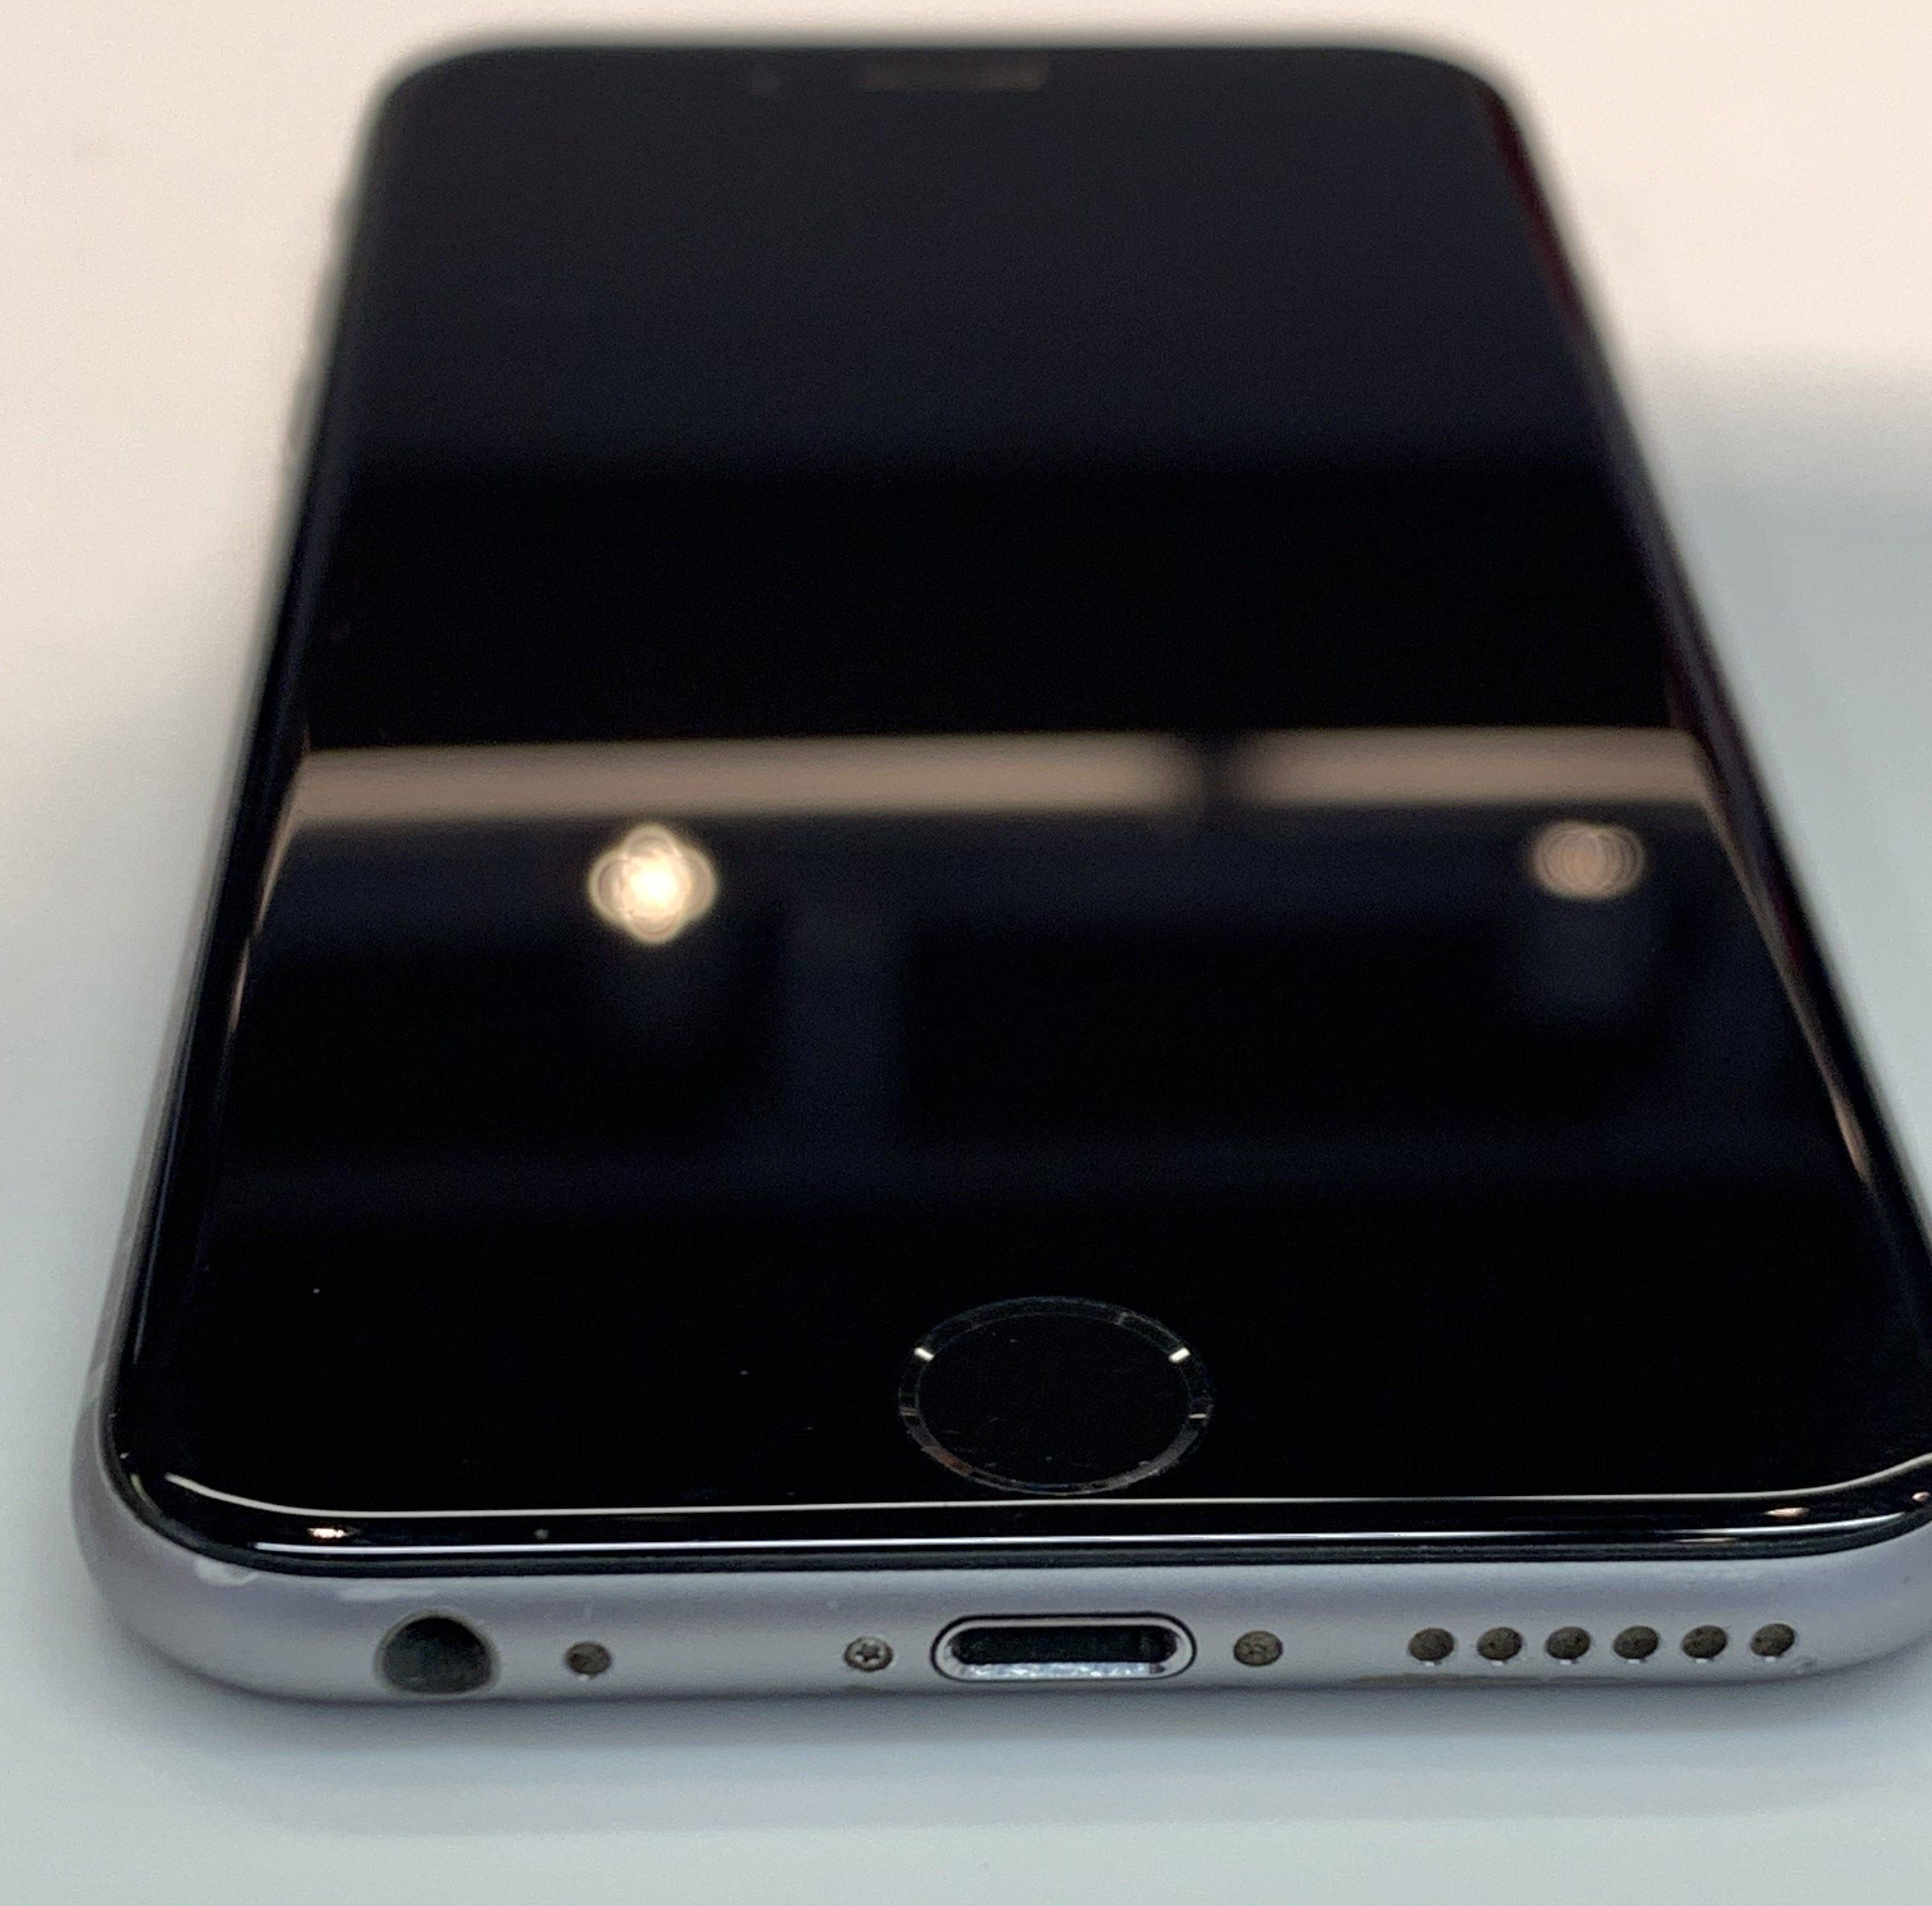 iPhone 6S 16GB, 16 GB, Space Gray, obraz 4